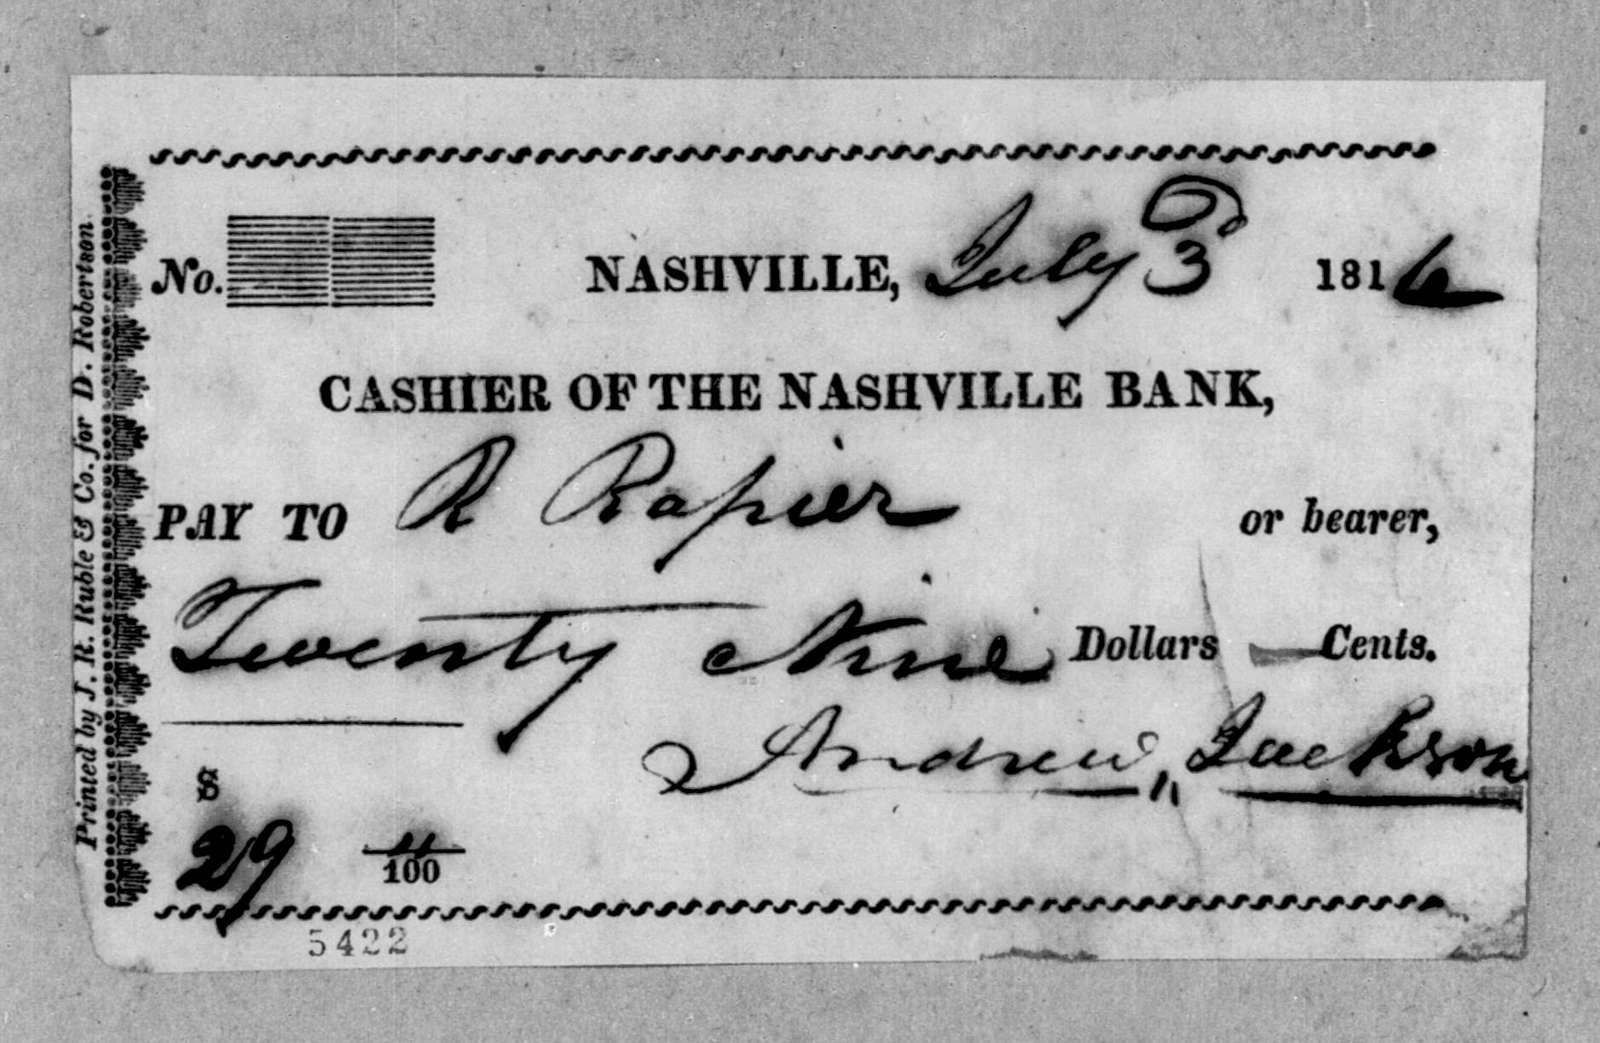 Andrew Jackson to Richard Rapier, July 3, 1816